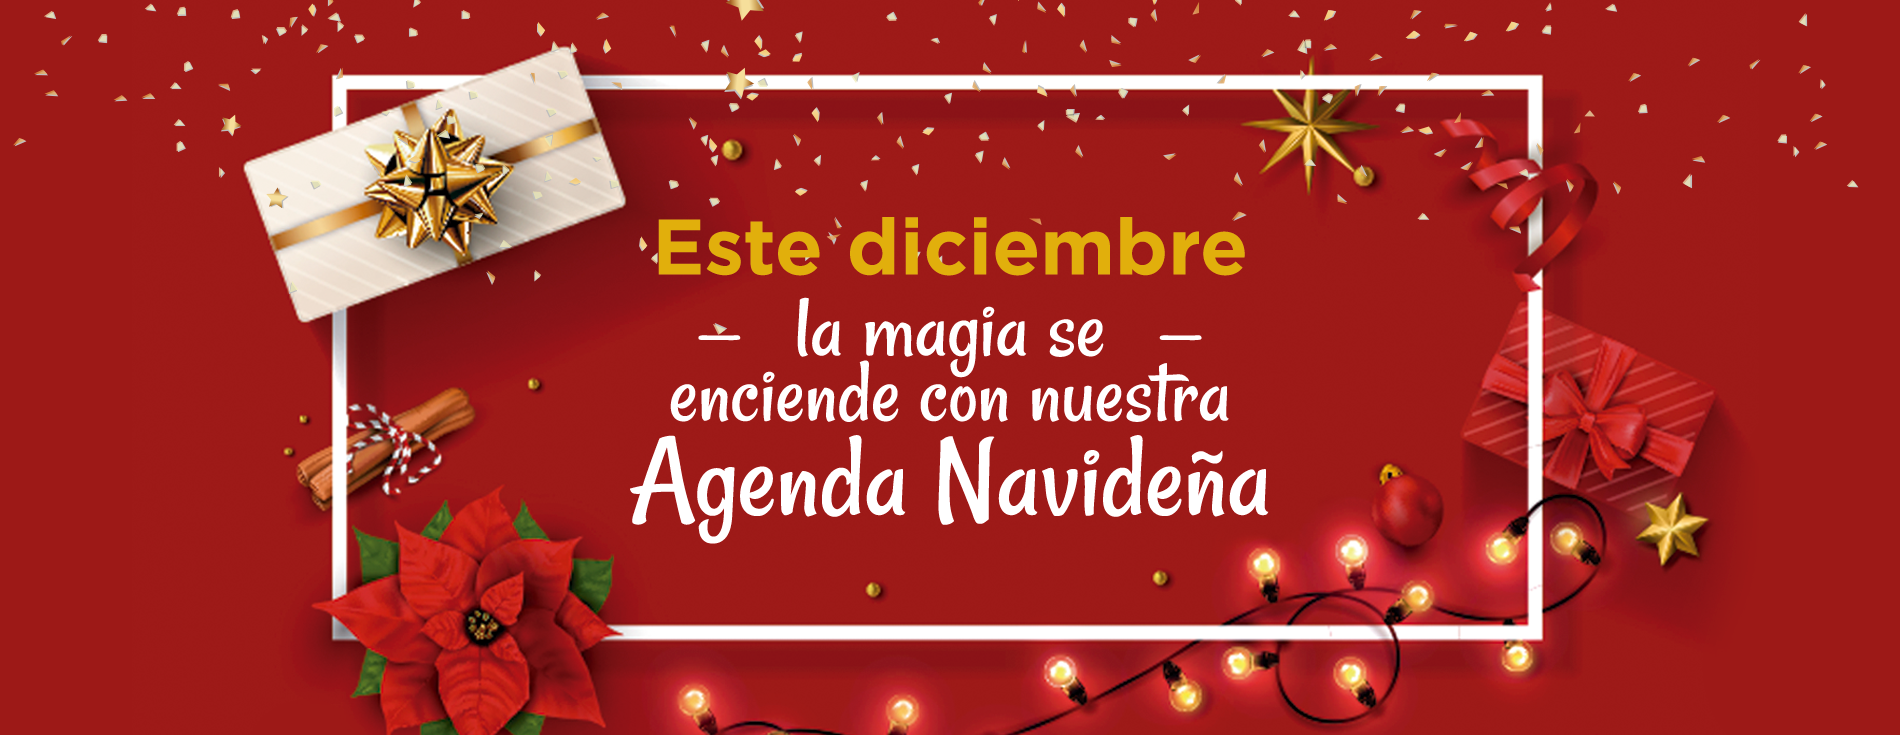 Agenda navideña - Tunja